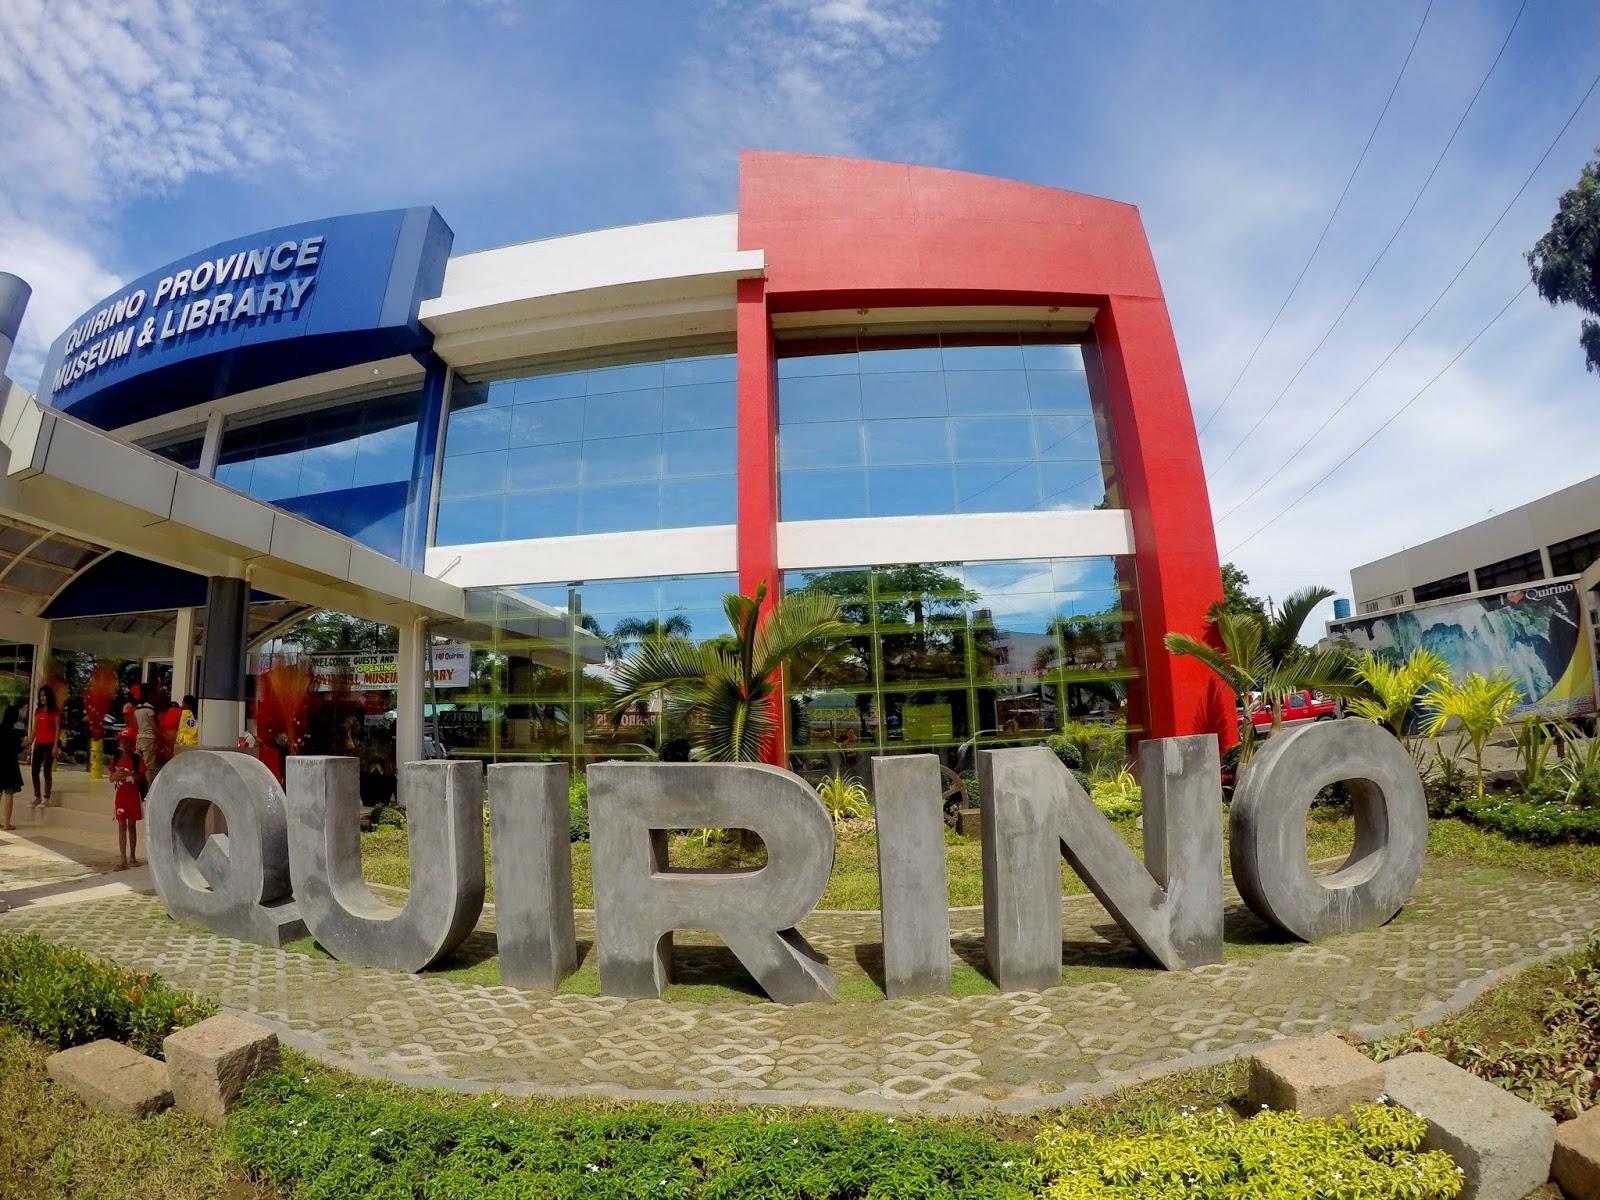 Quirino Province Museum & Library